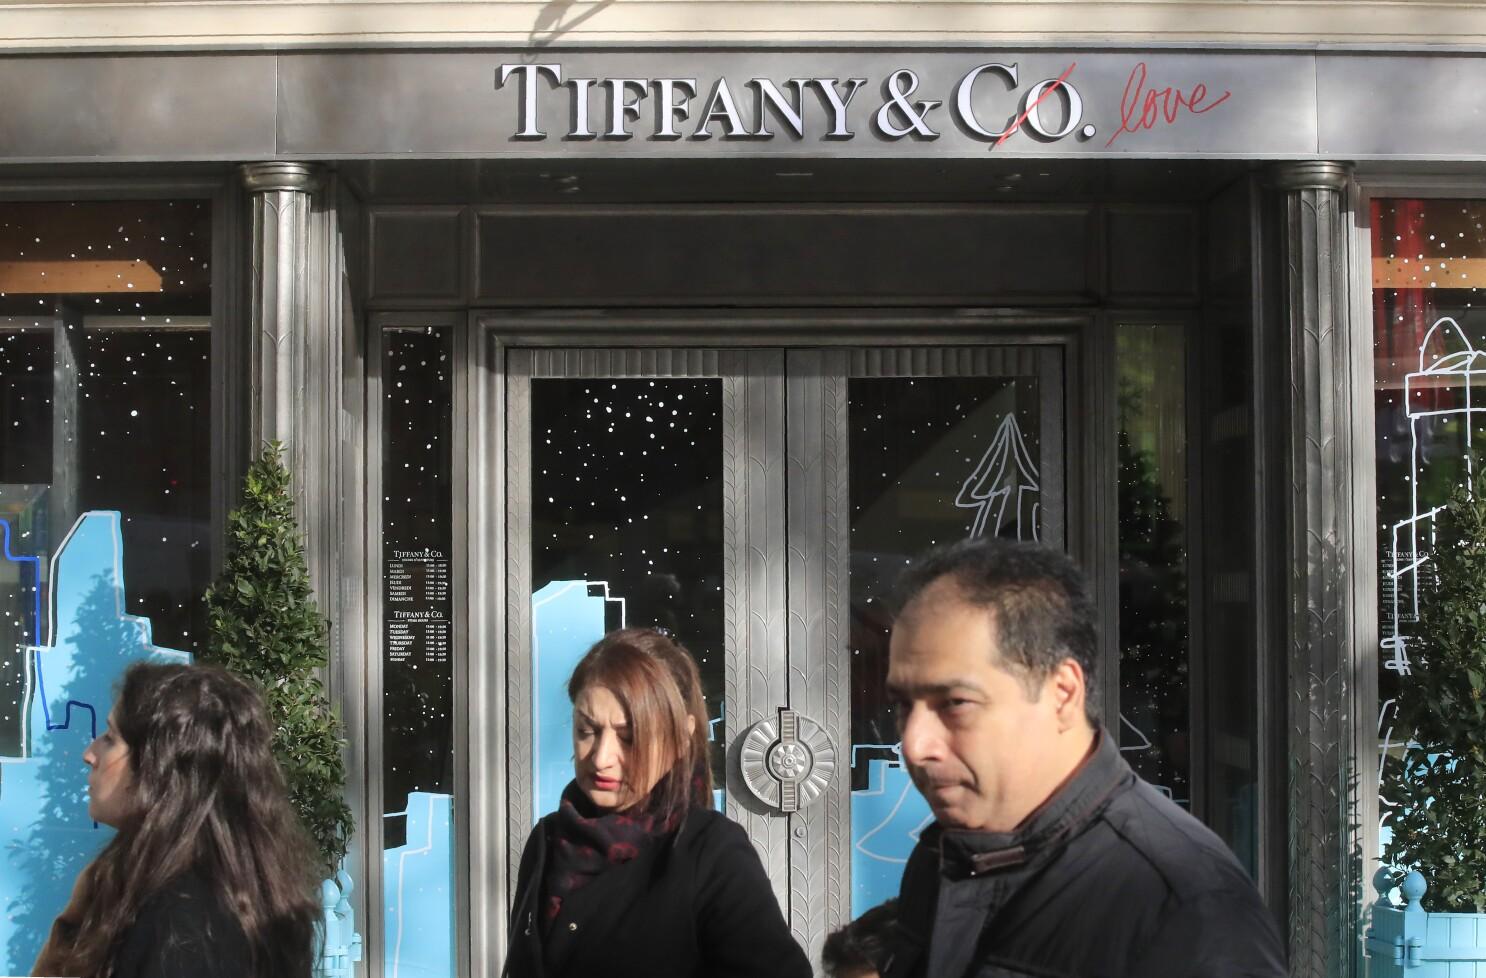 LVMH cancela compra de Tiffany por plan de aranceles de EEUU - San Diego  Union-Tribune en Español